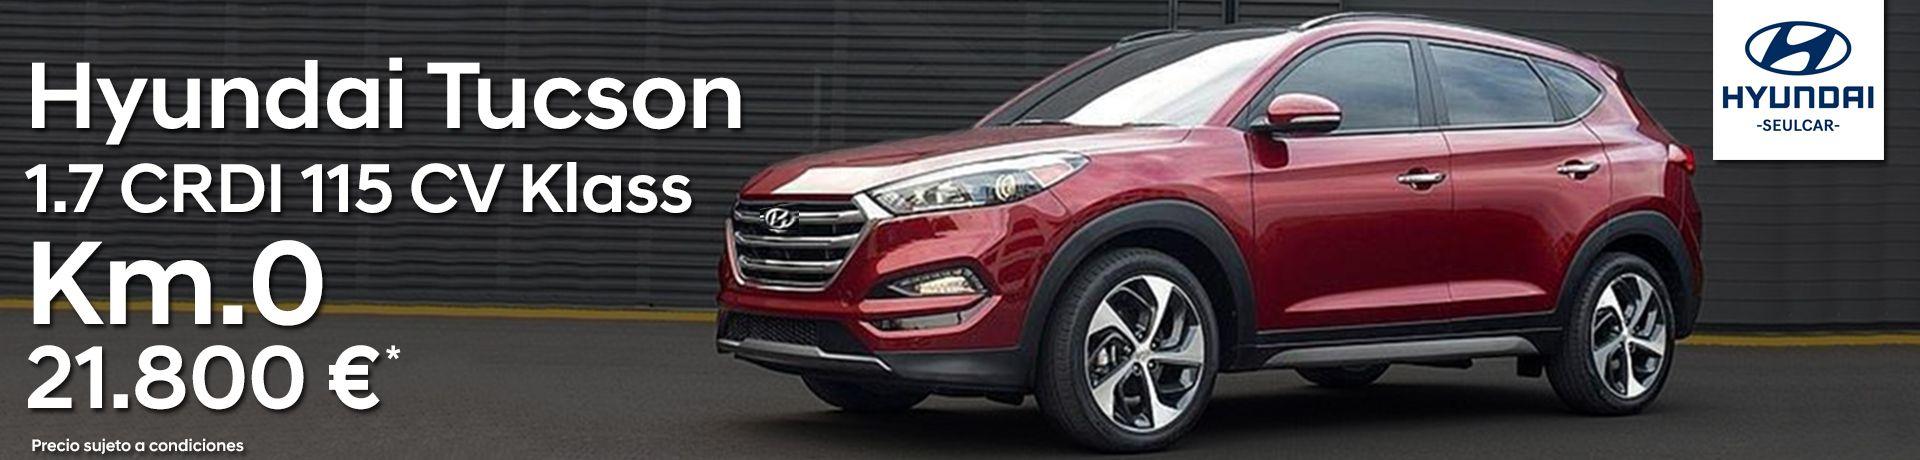 ¡Única unidad! Hyundai Tucson Klass 1.7 CRDI 115 cv Km.0